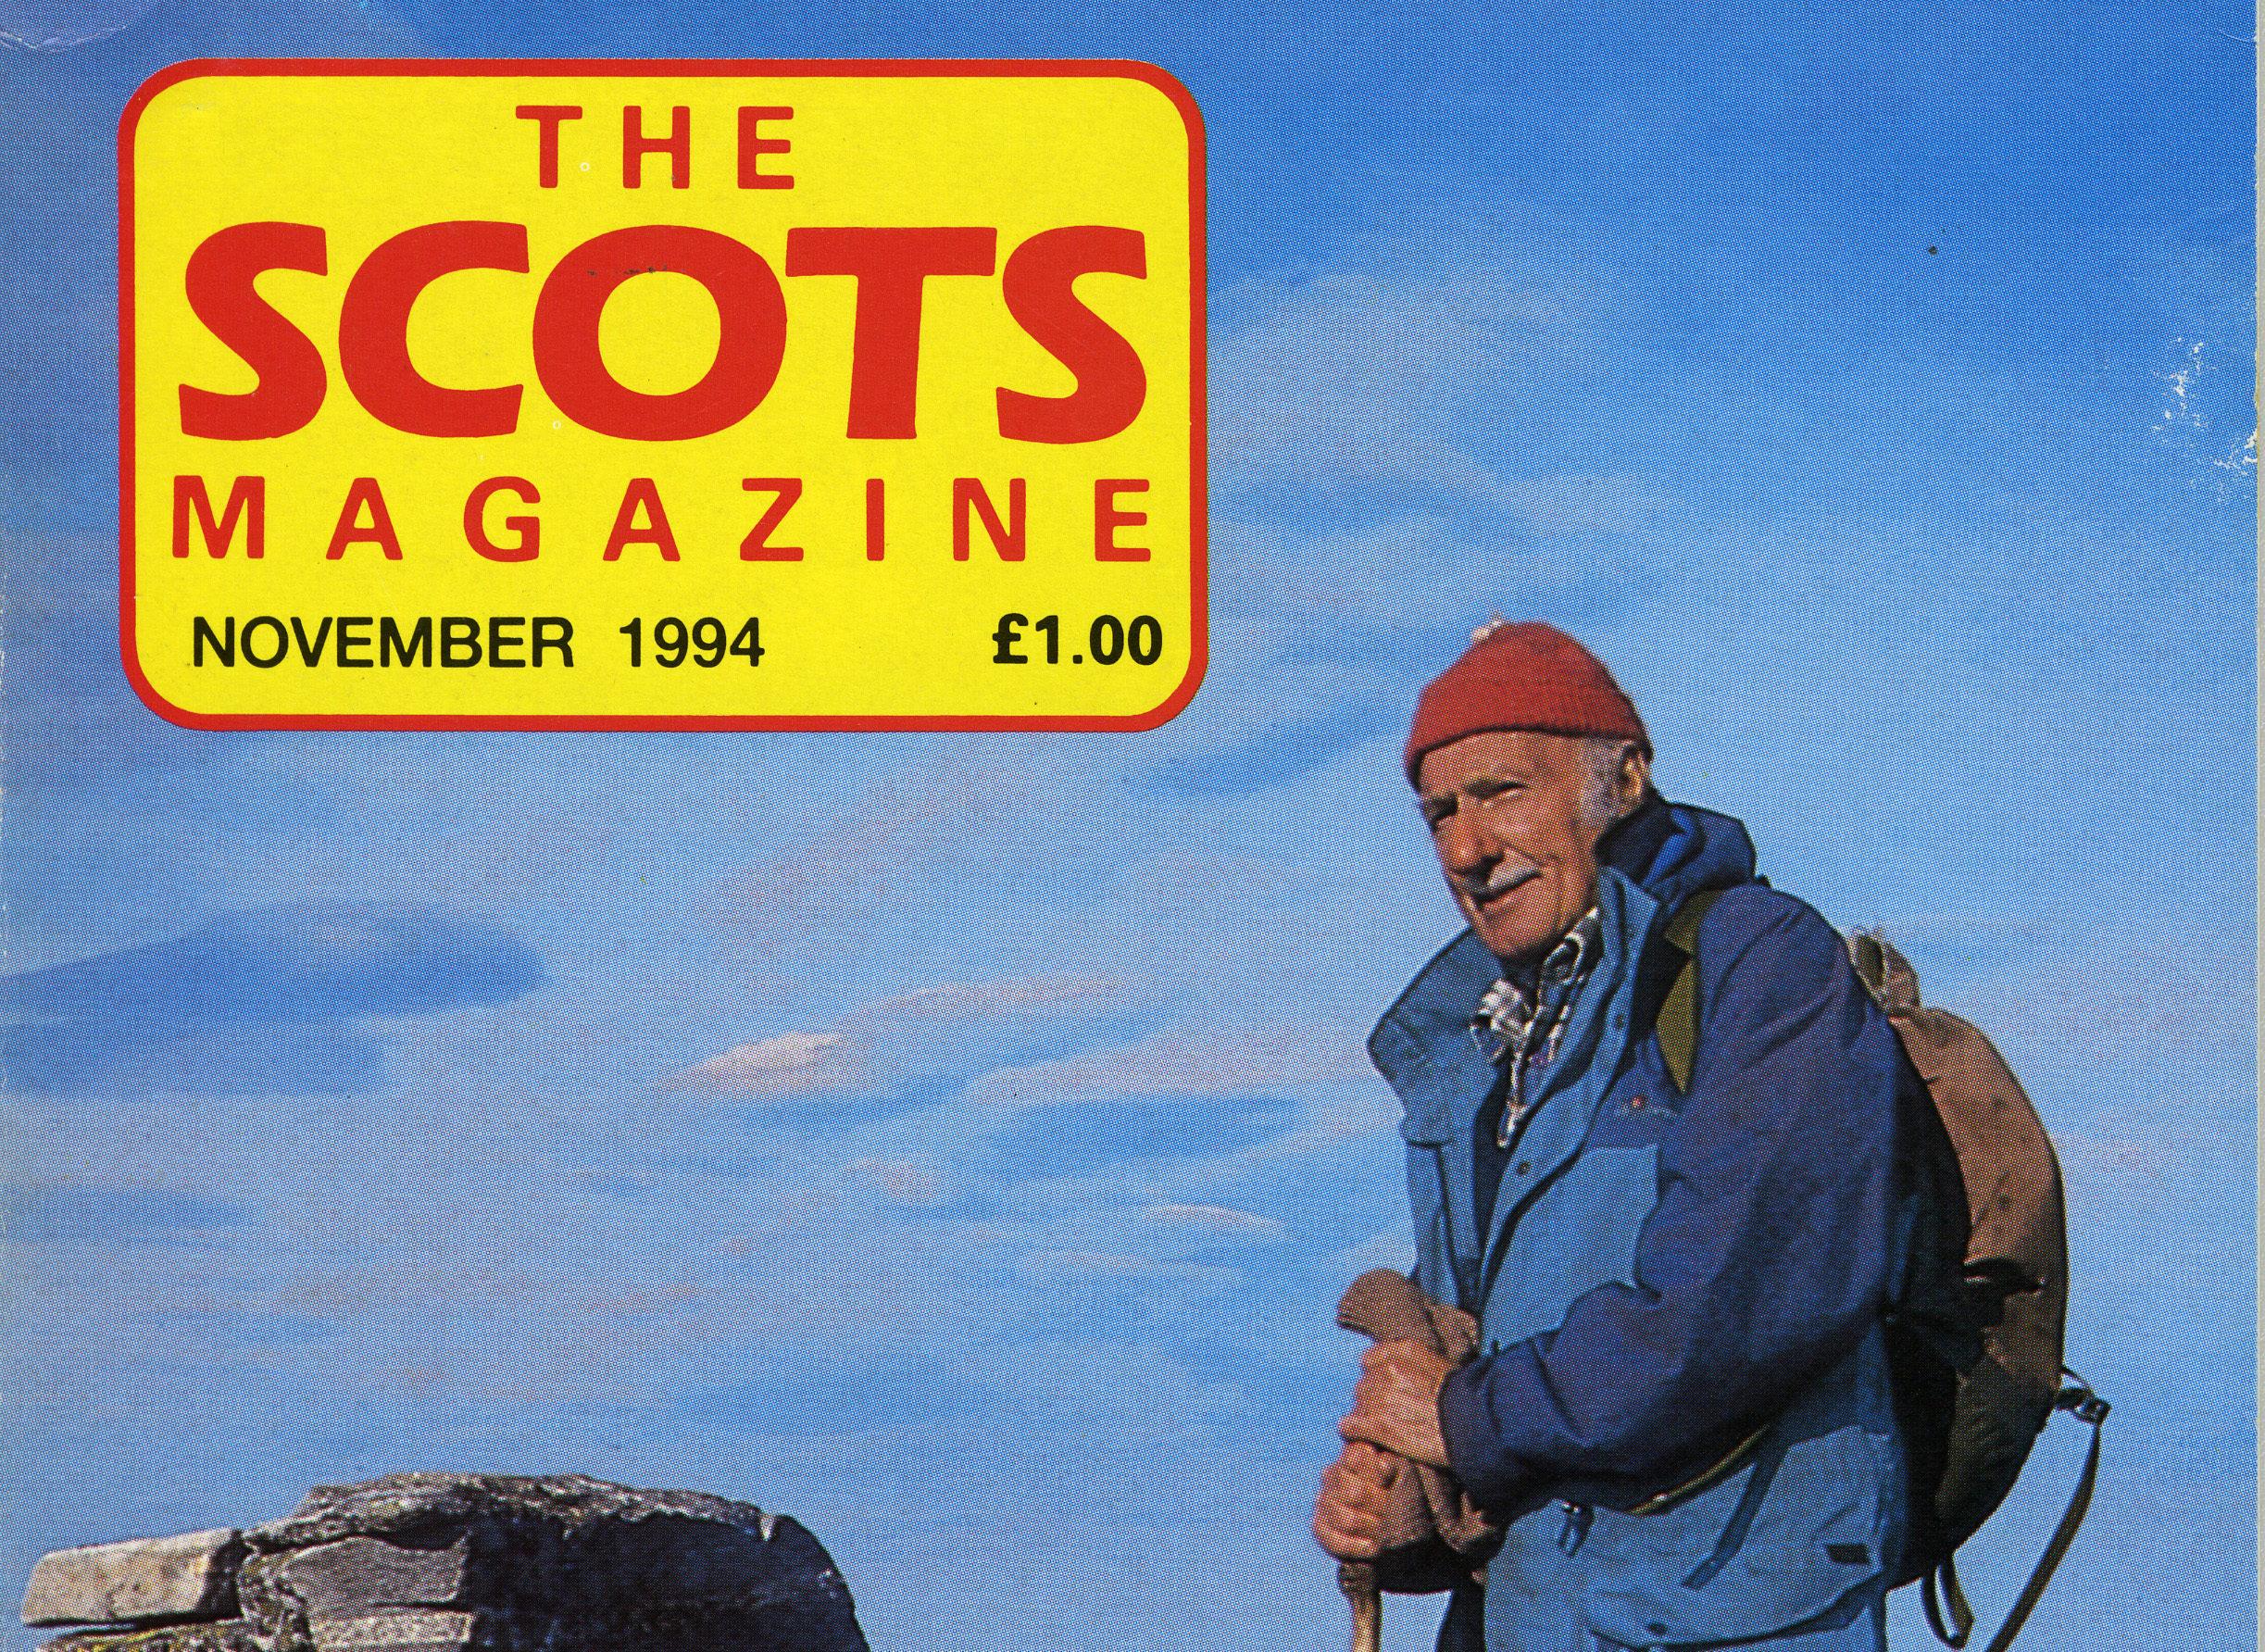 The Scots Magazine, November 1994, Tom Weir